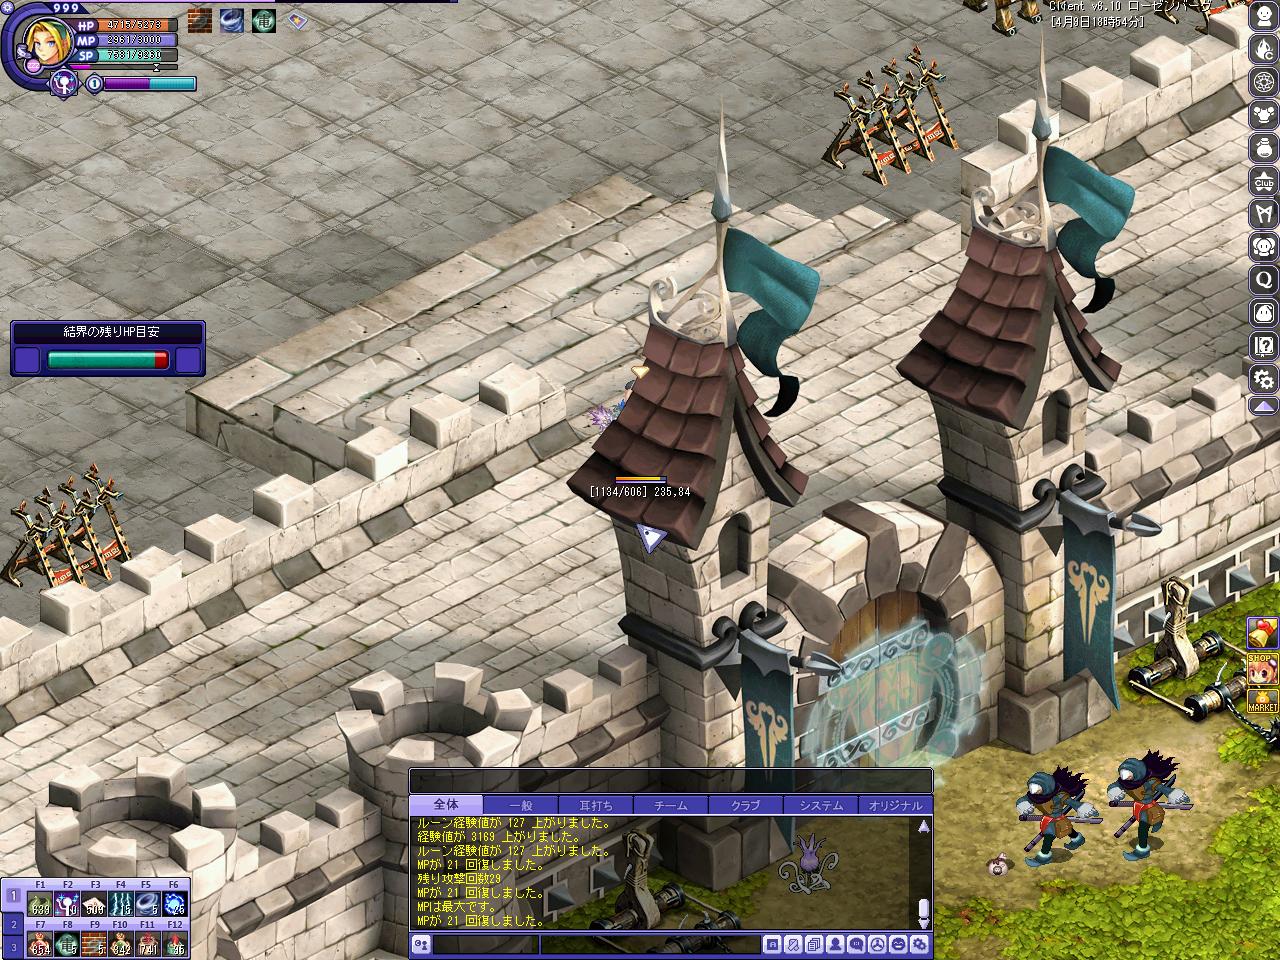 screenshot501.png